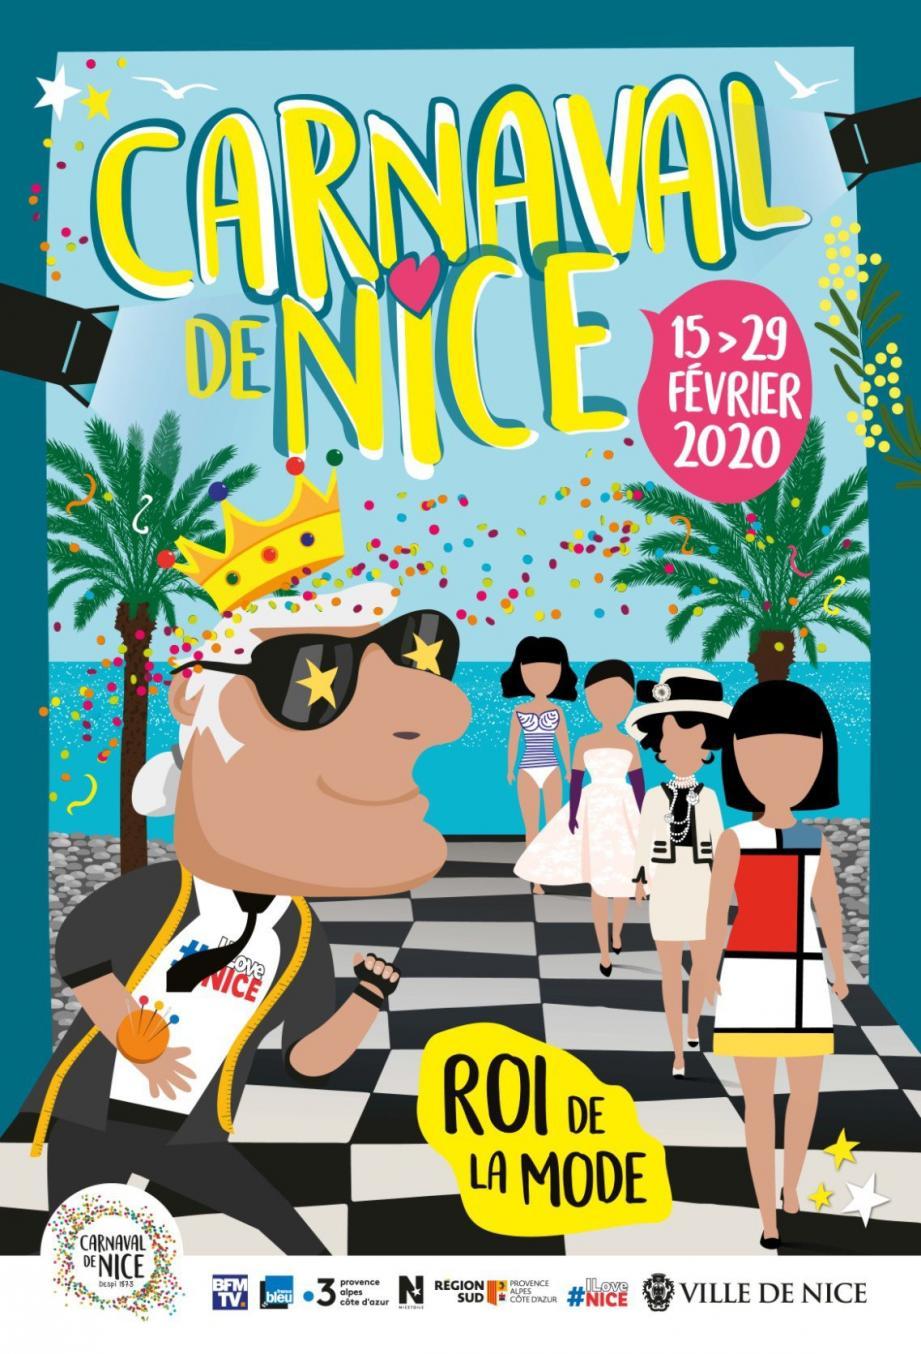 Nice Carnival 2020 poster - Credit Ville de Nice